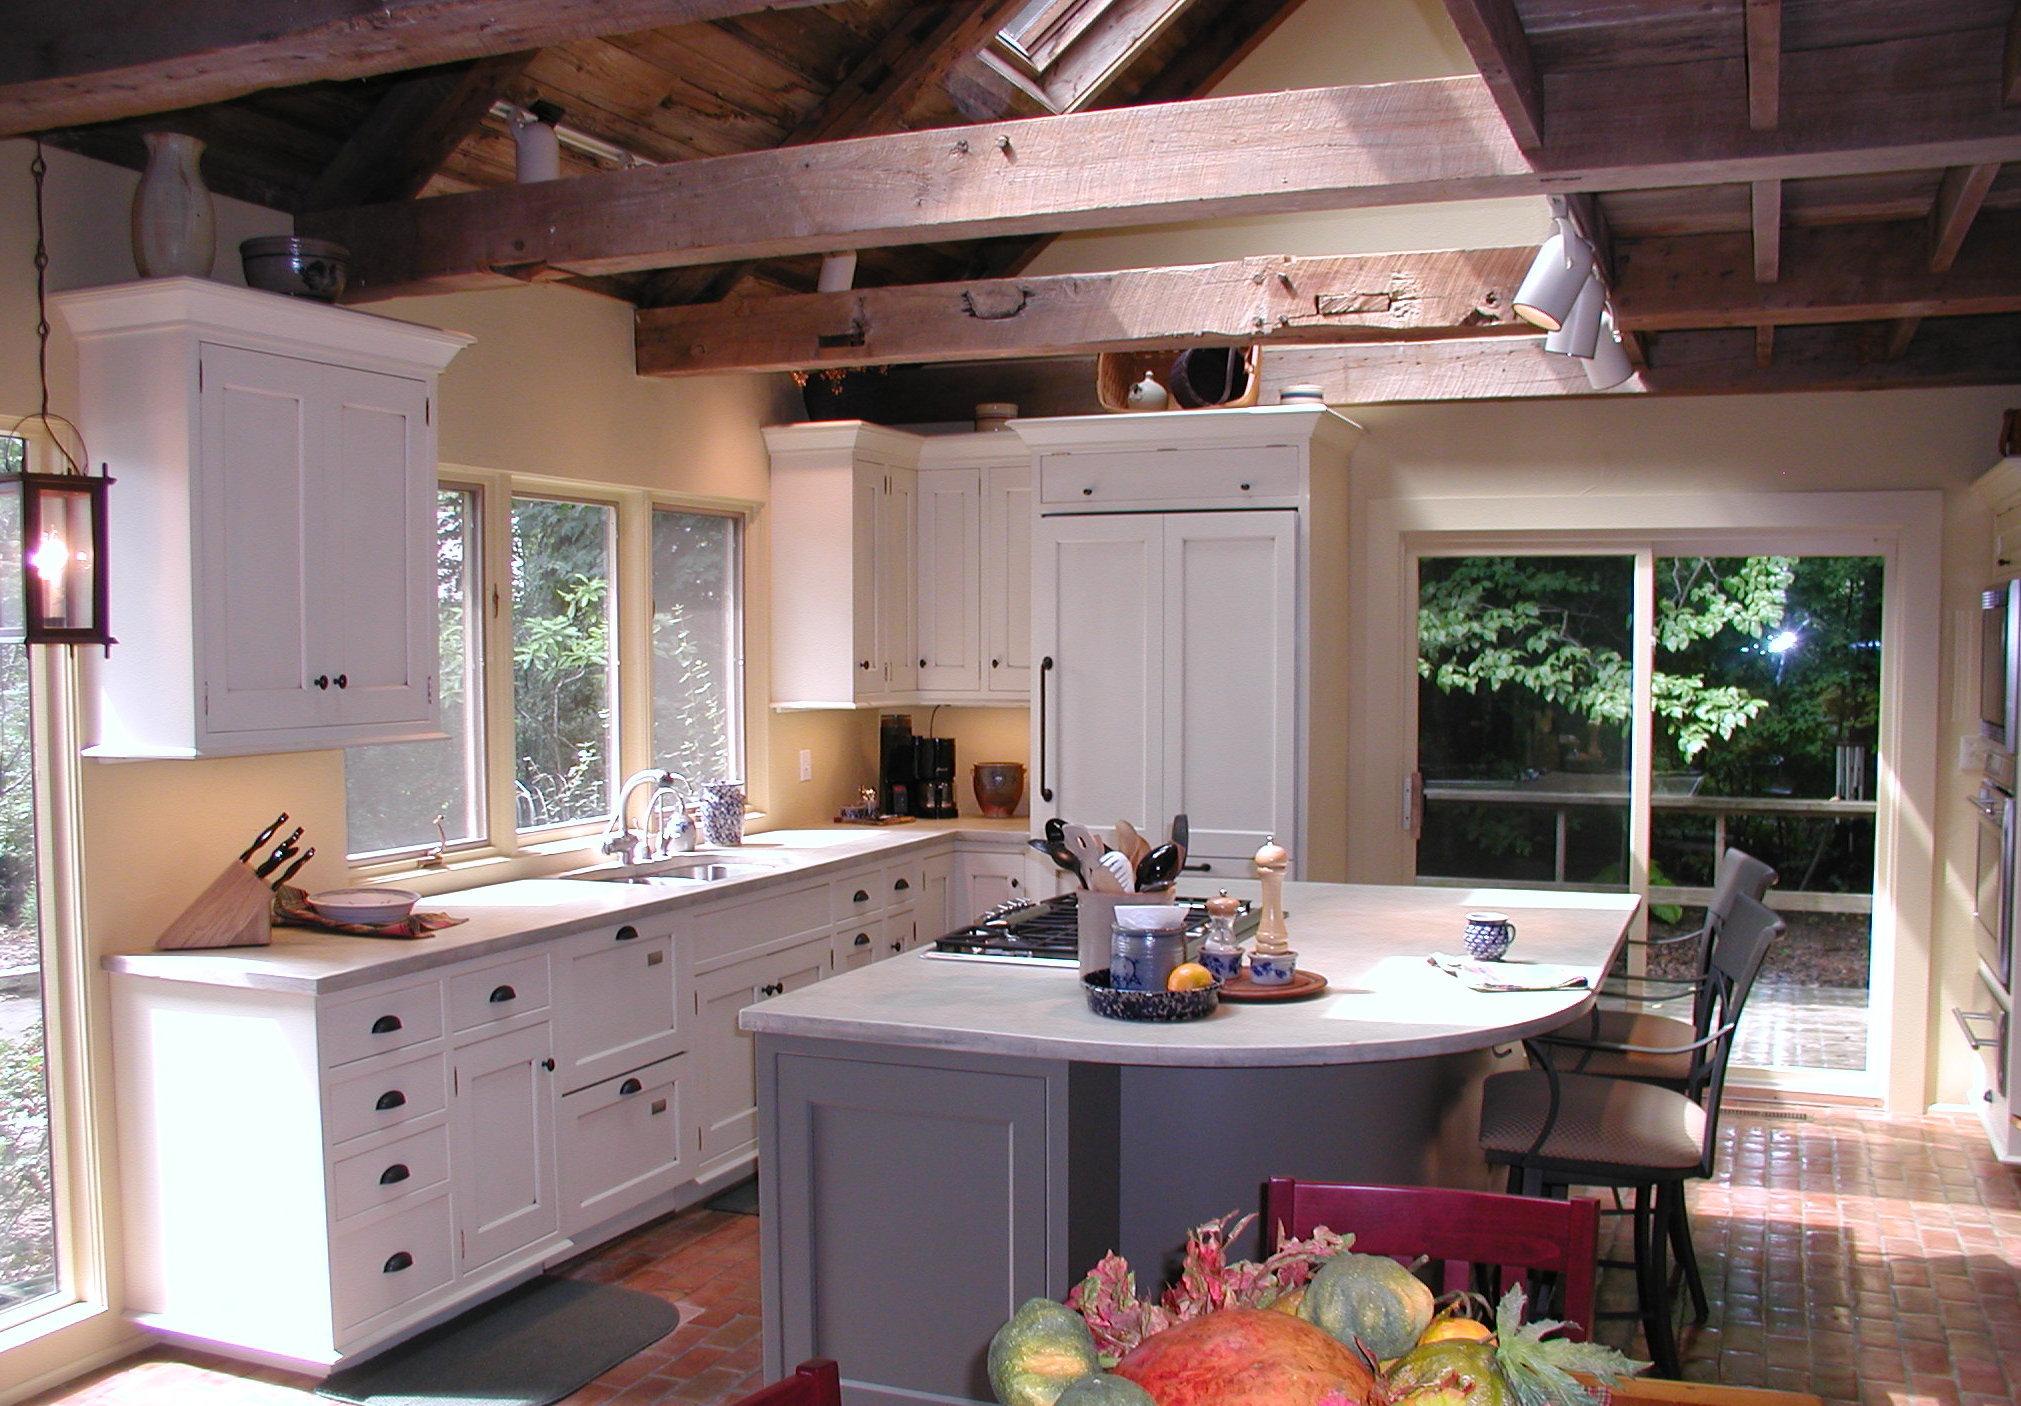 kitchen designs pictures design ideas photo - 8